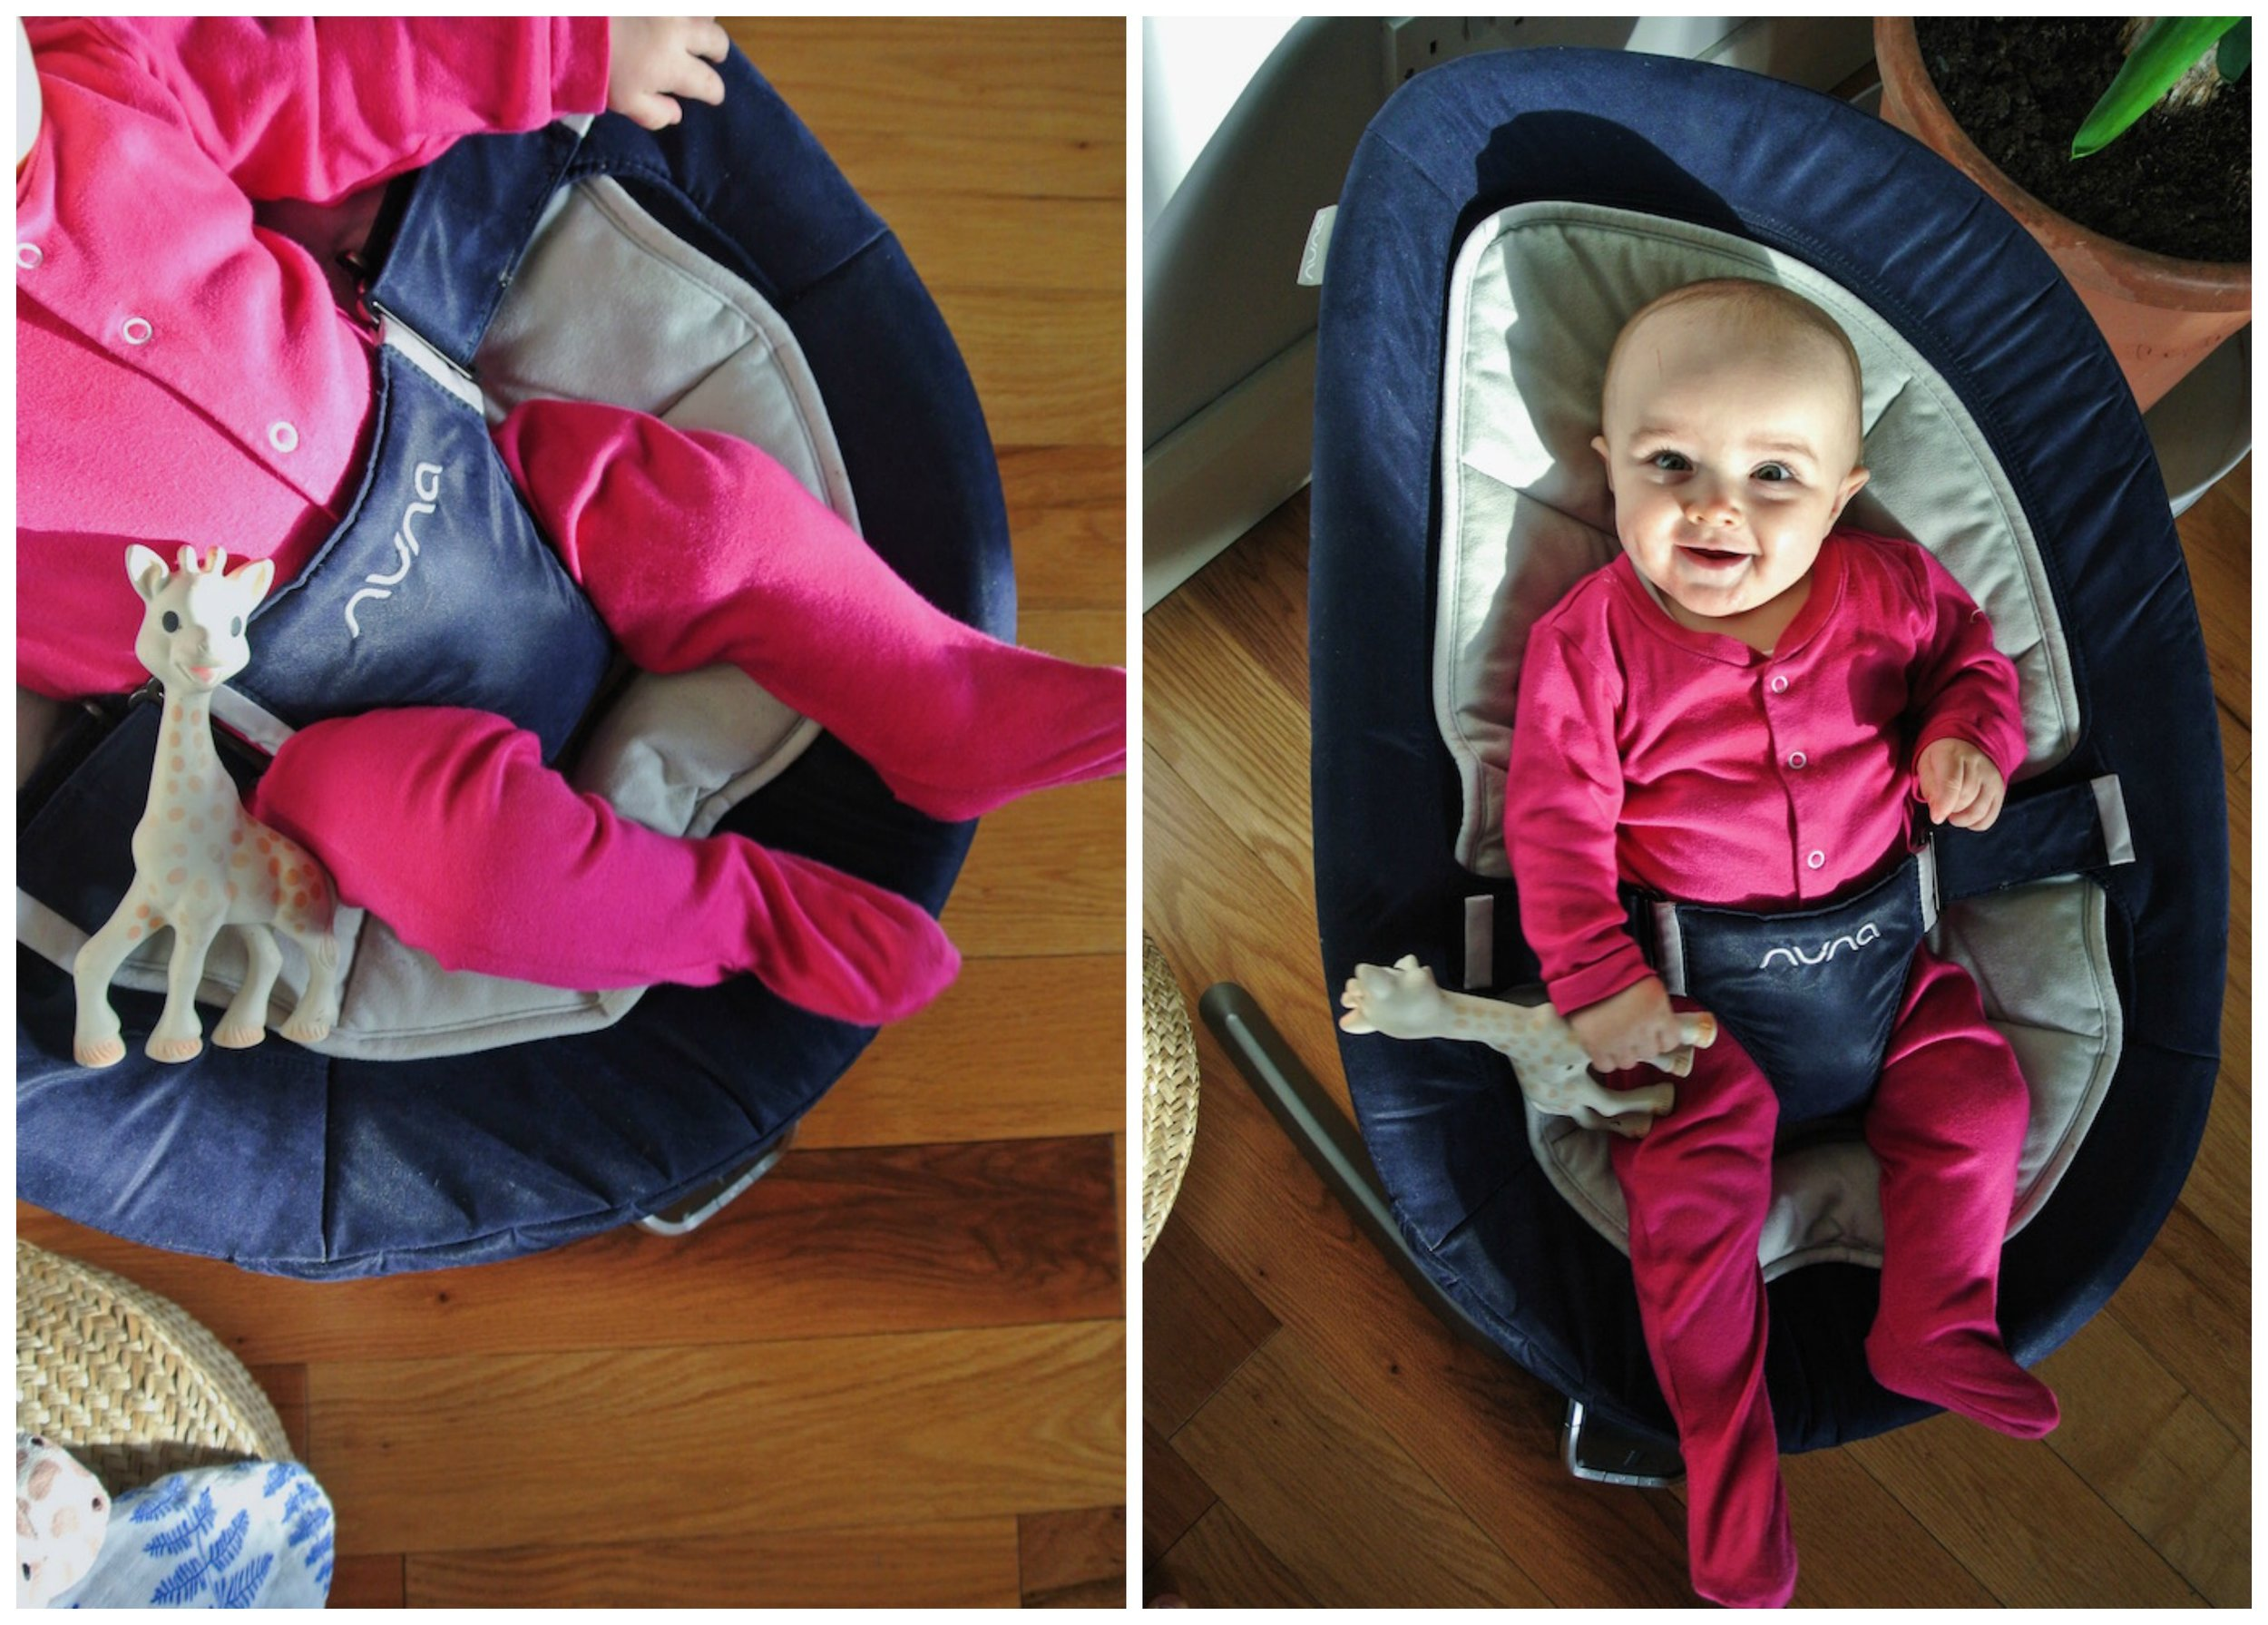 Nuna Leaf - End of maternity leave. MelWiggins.com